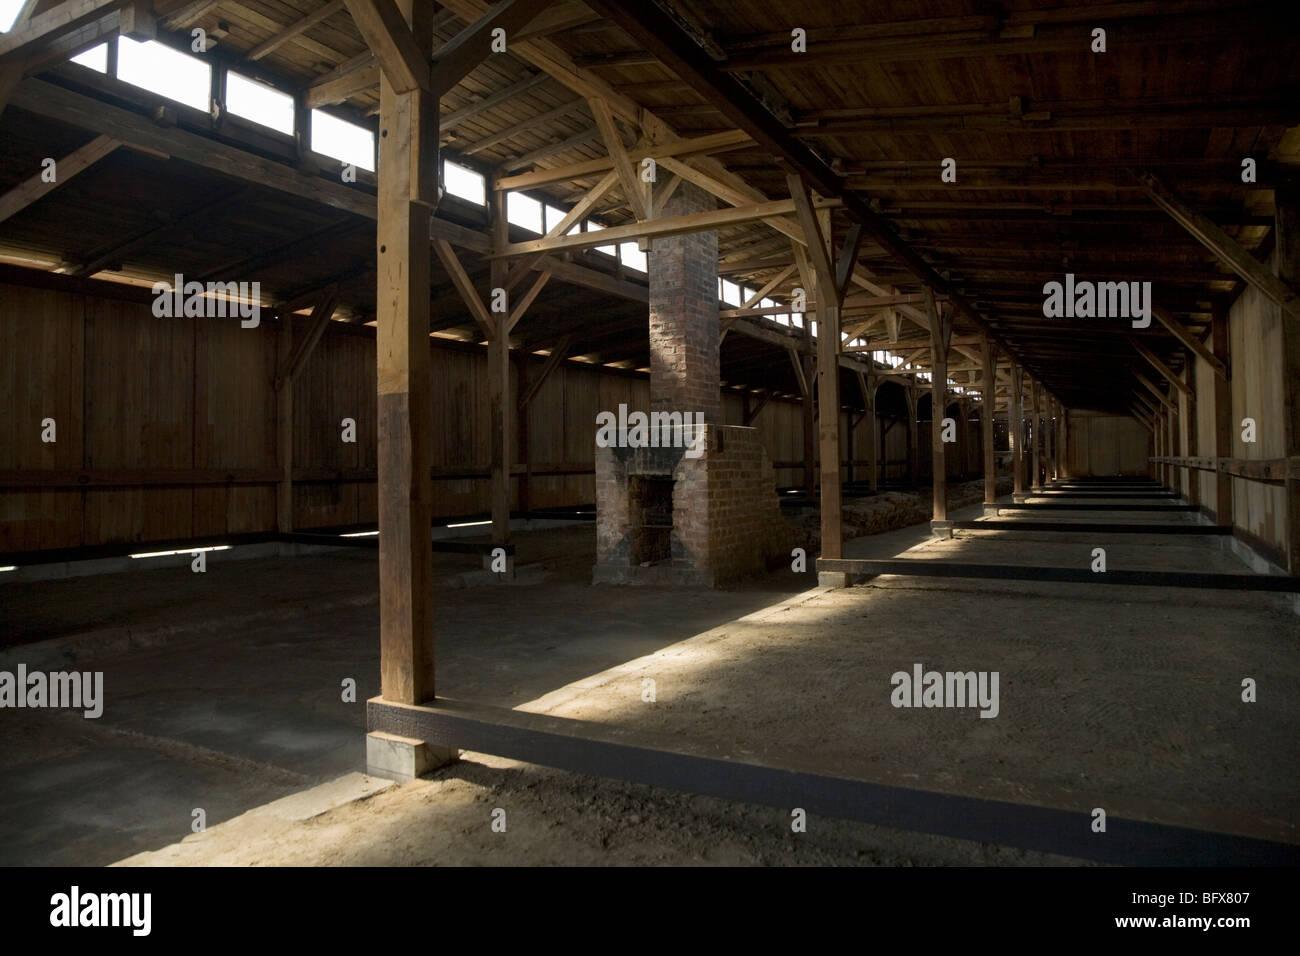 Inside a hut / shed of the Birkenau (Auschwitz II - Birkenau) Nazi death camp in Oswiecim, Poland. - Stock Image